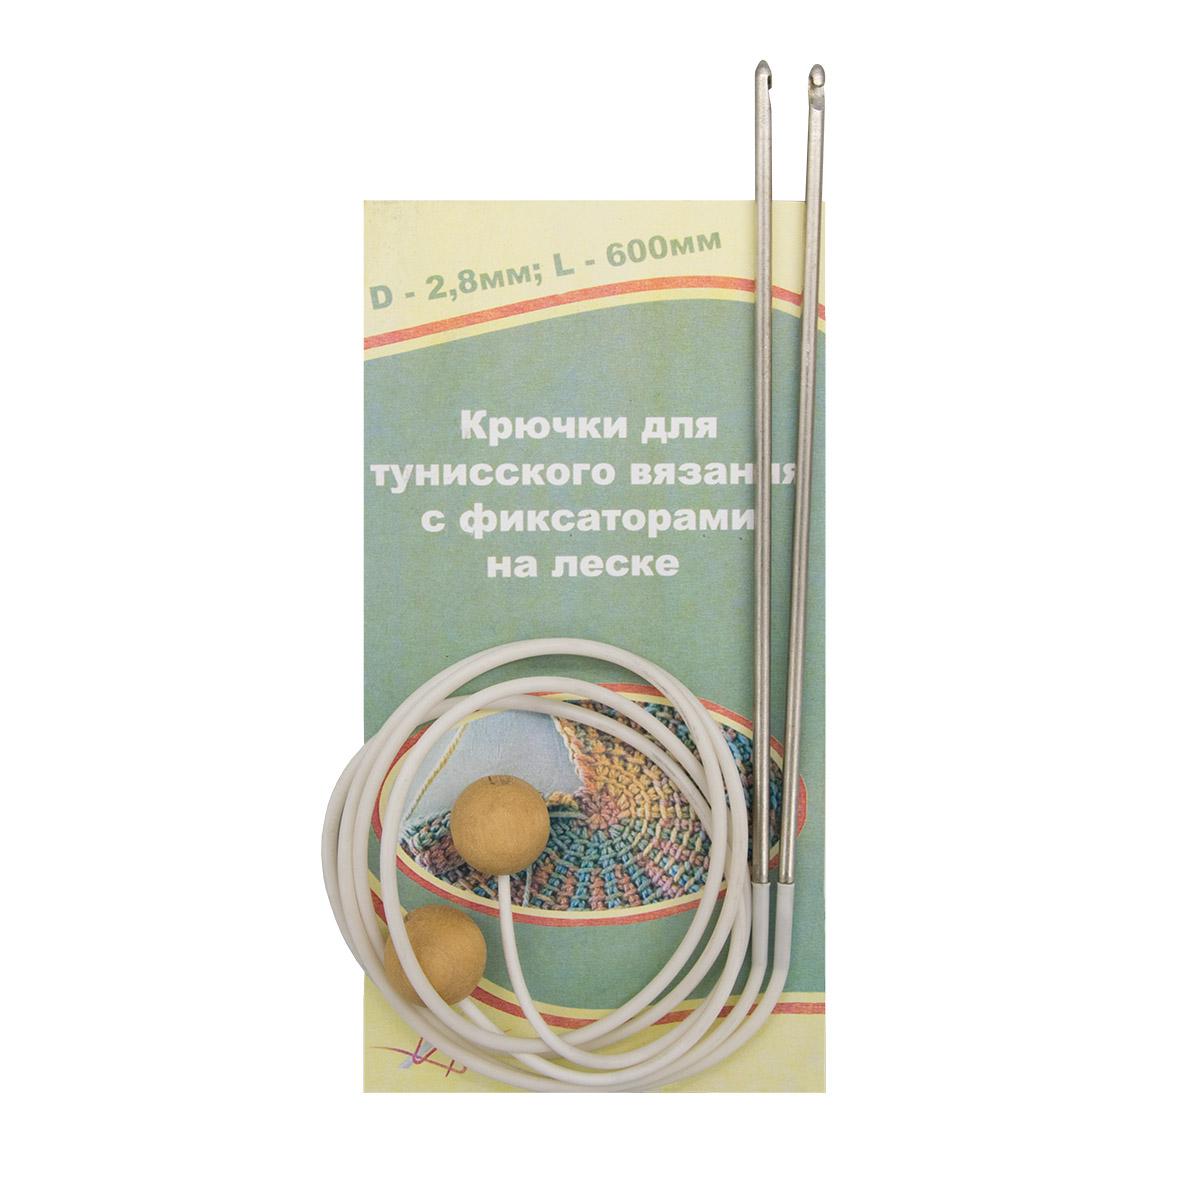 Крючки для тунисского вязания с фиксаторами на леске